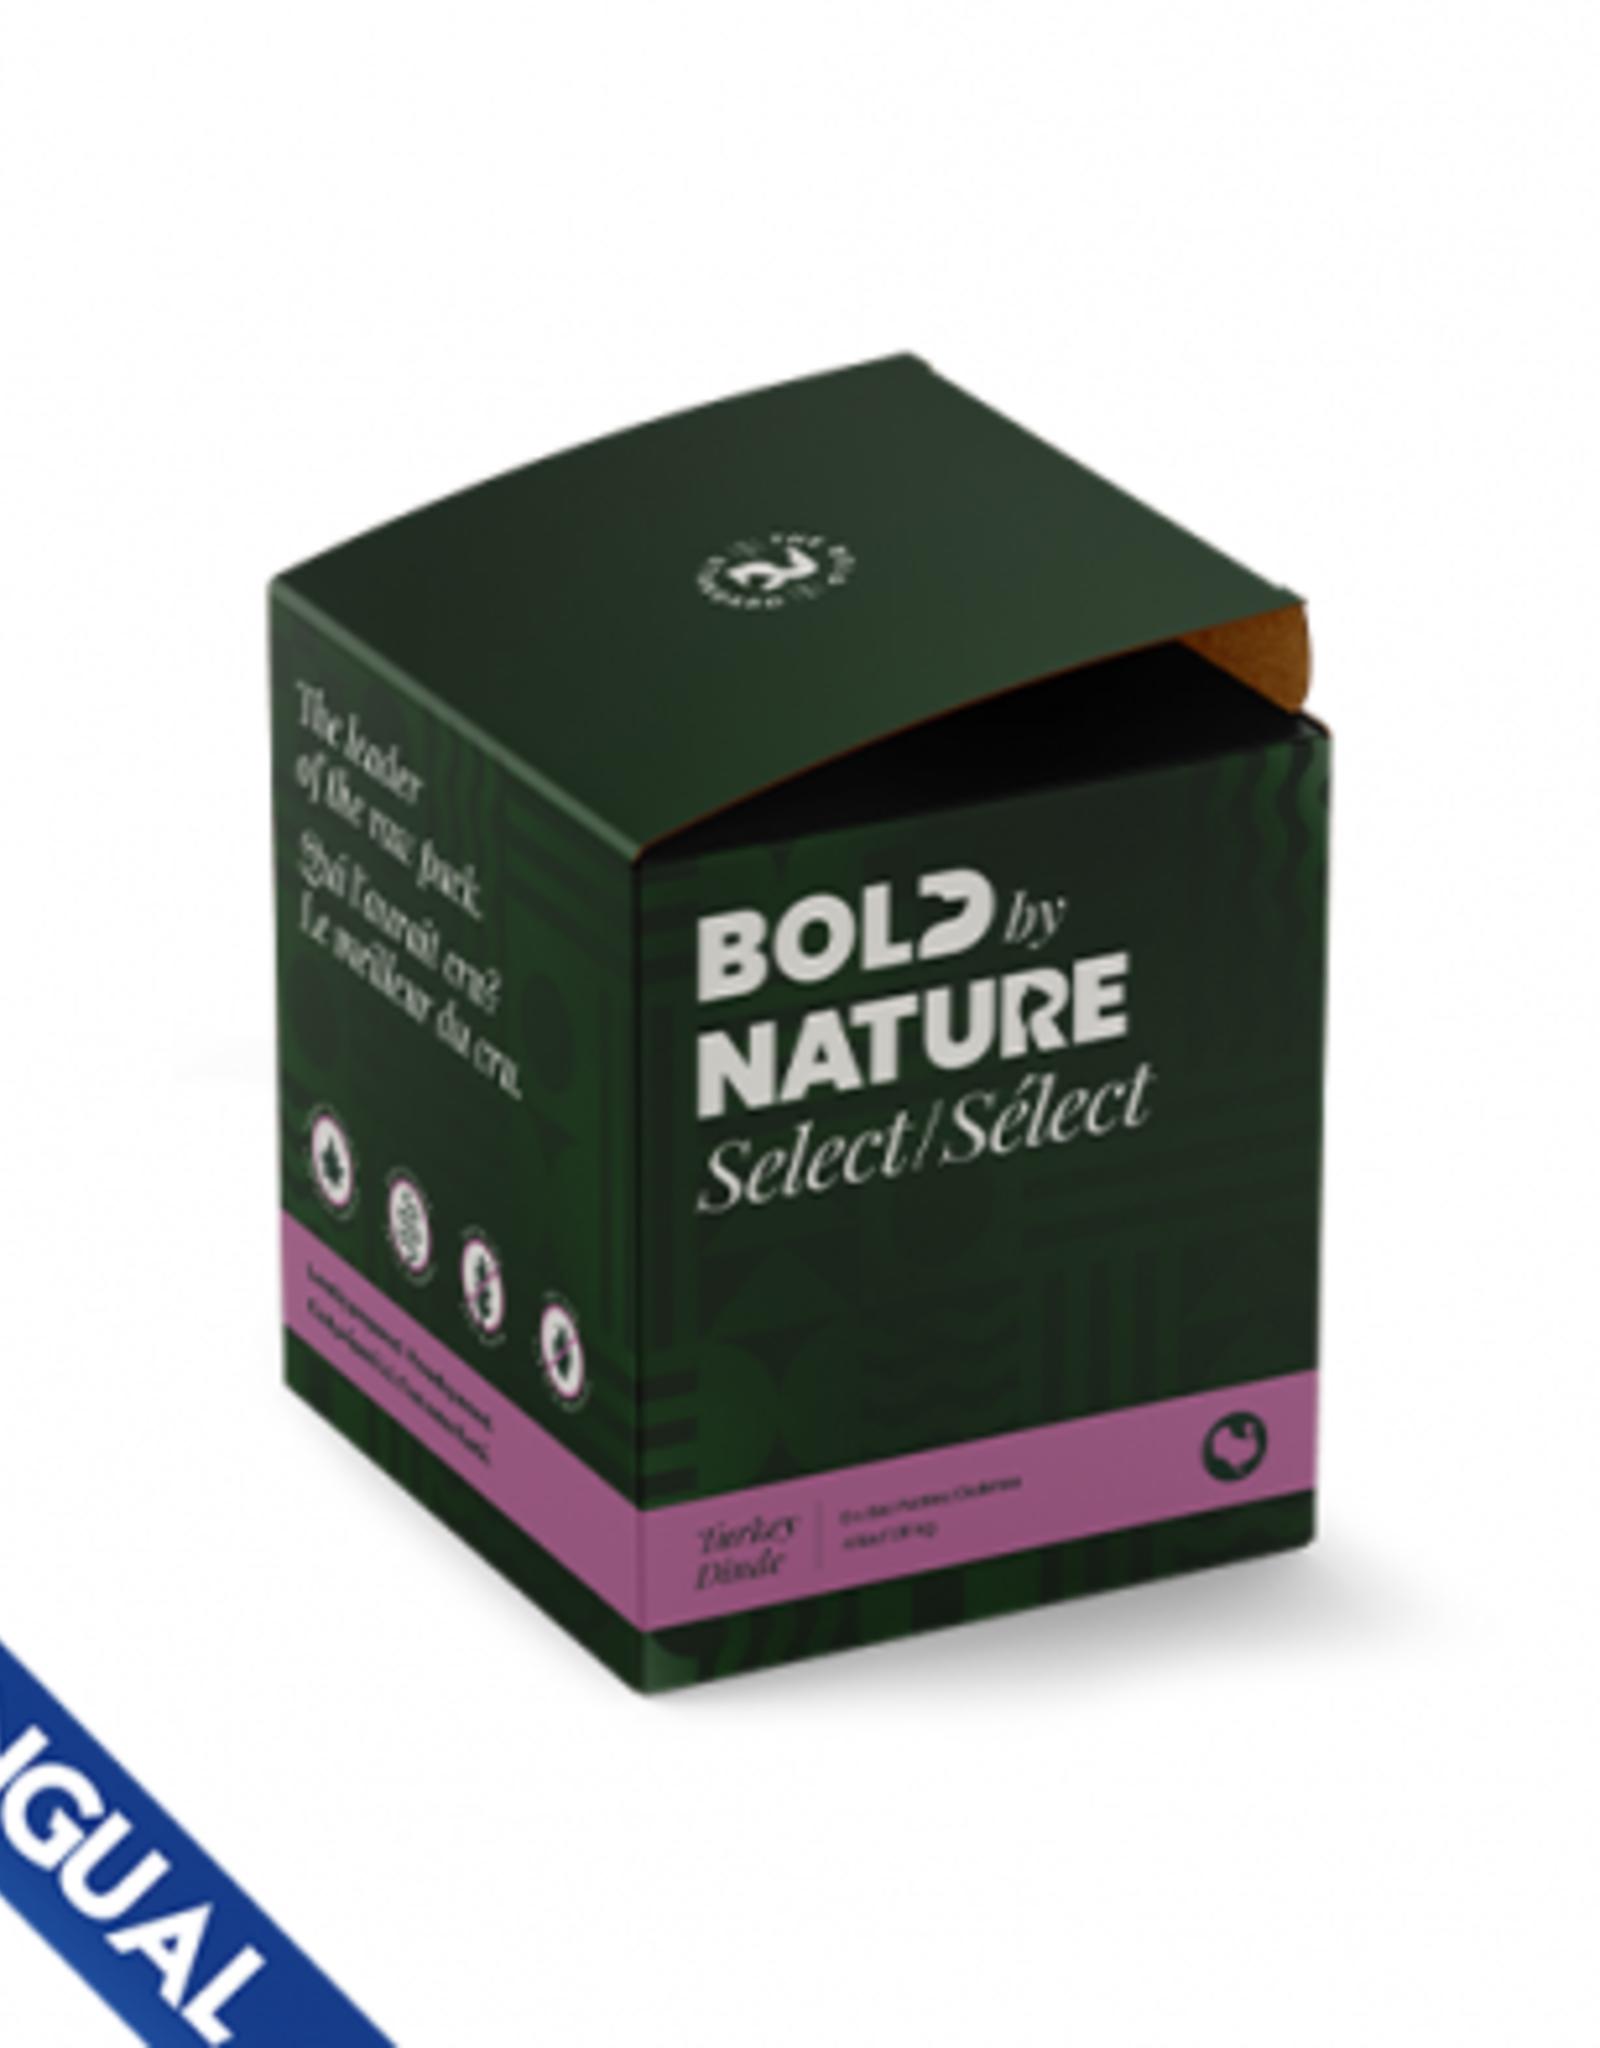 Bold Raw BOLD BY NATURE SELECT TURKEY FROZEN DOG FOOD 4 LB BOX (8 X 8 OZ PATTIES)